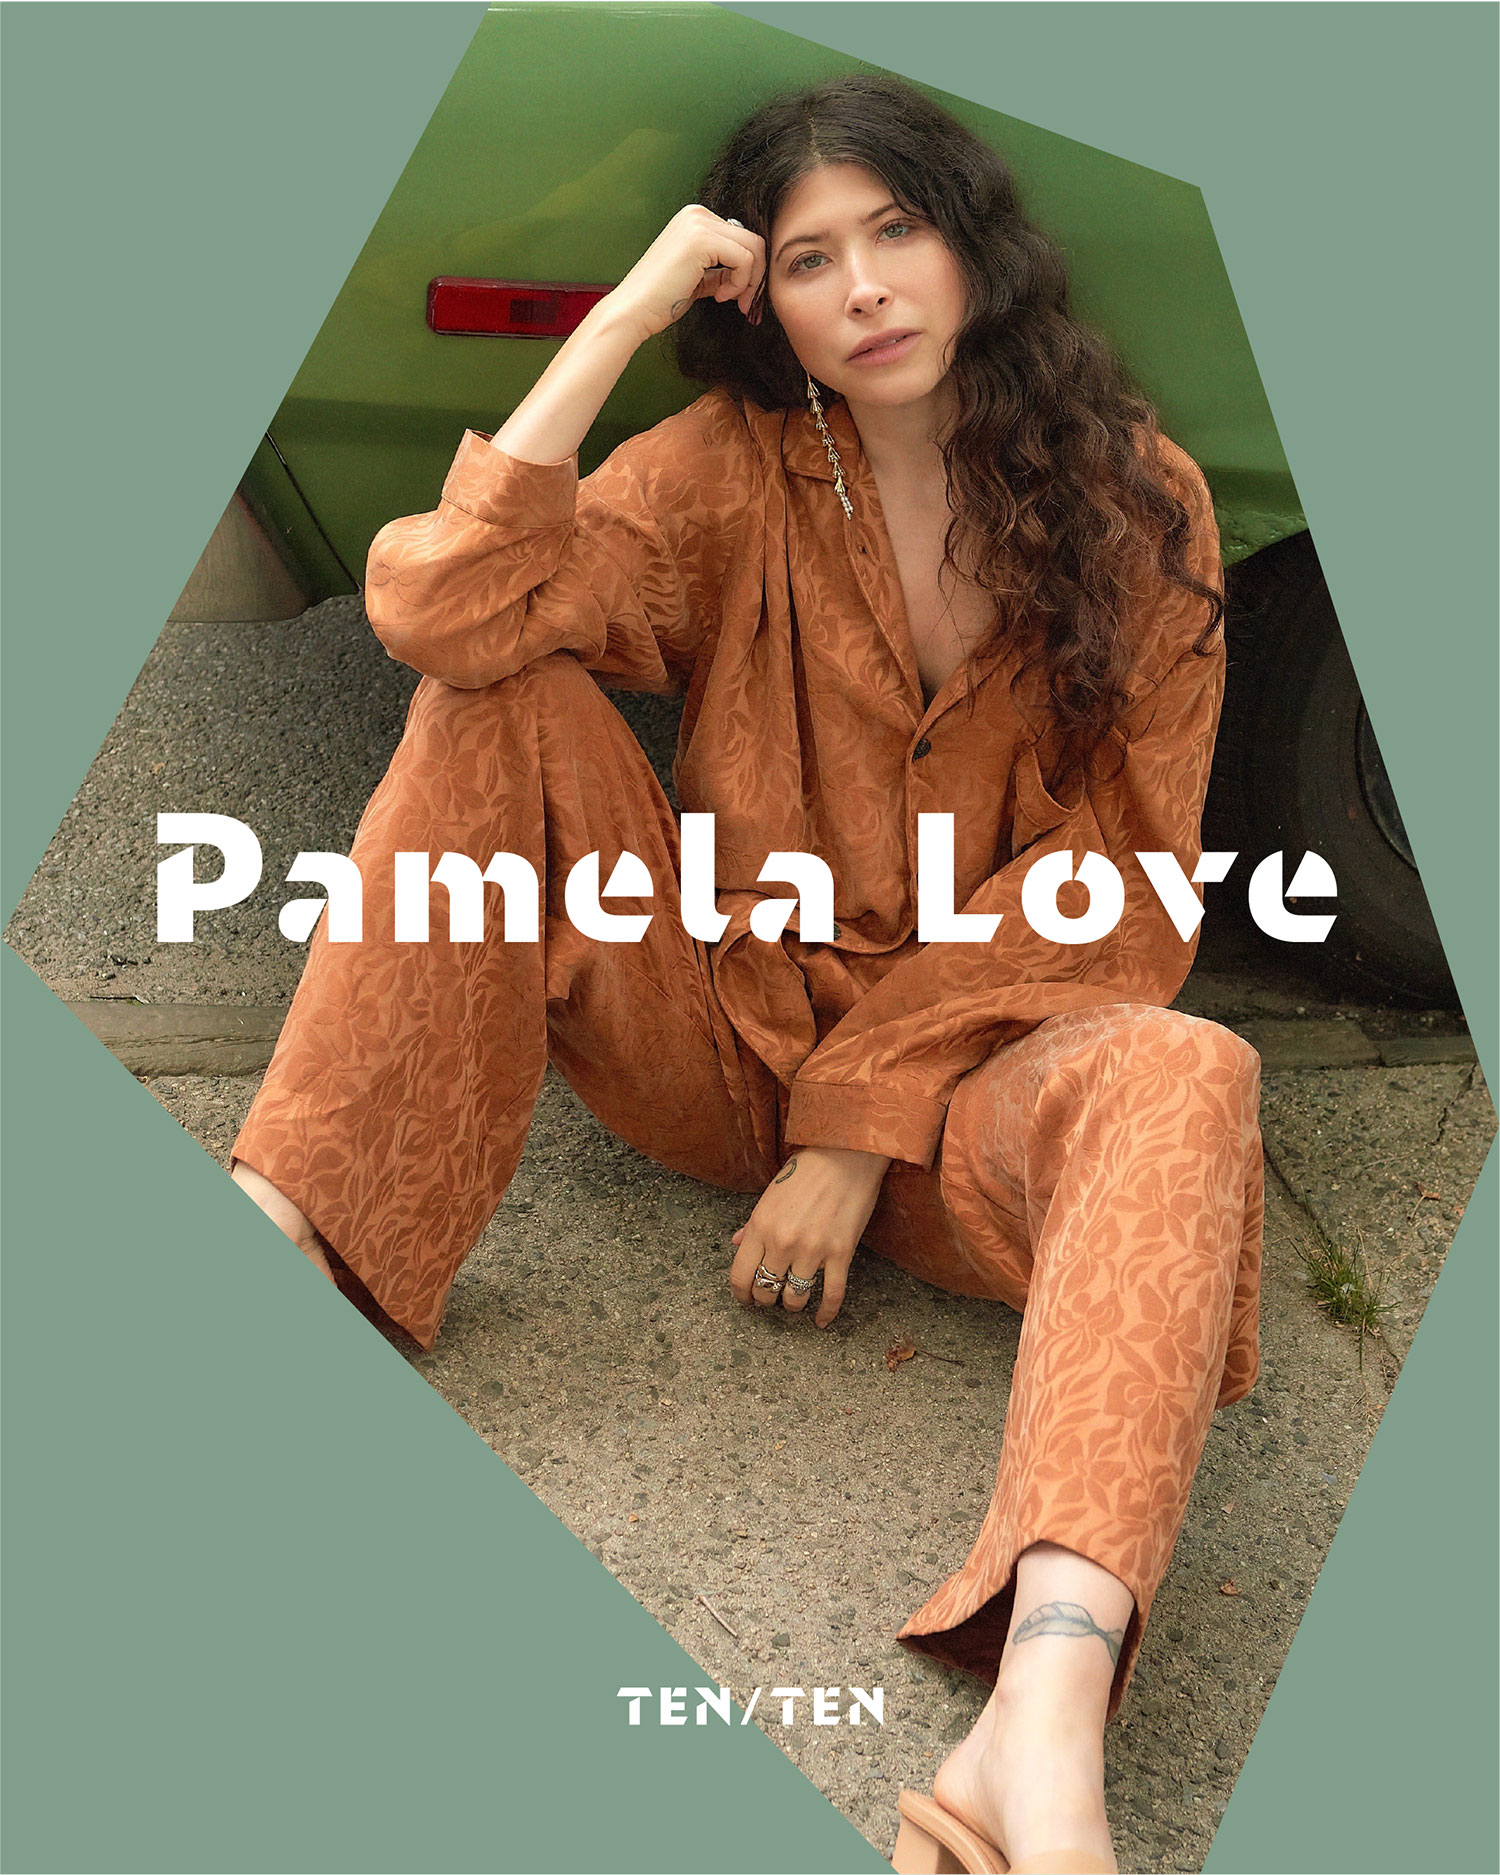 Pamela Love TenTen Social Graphic Portraits